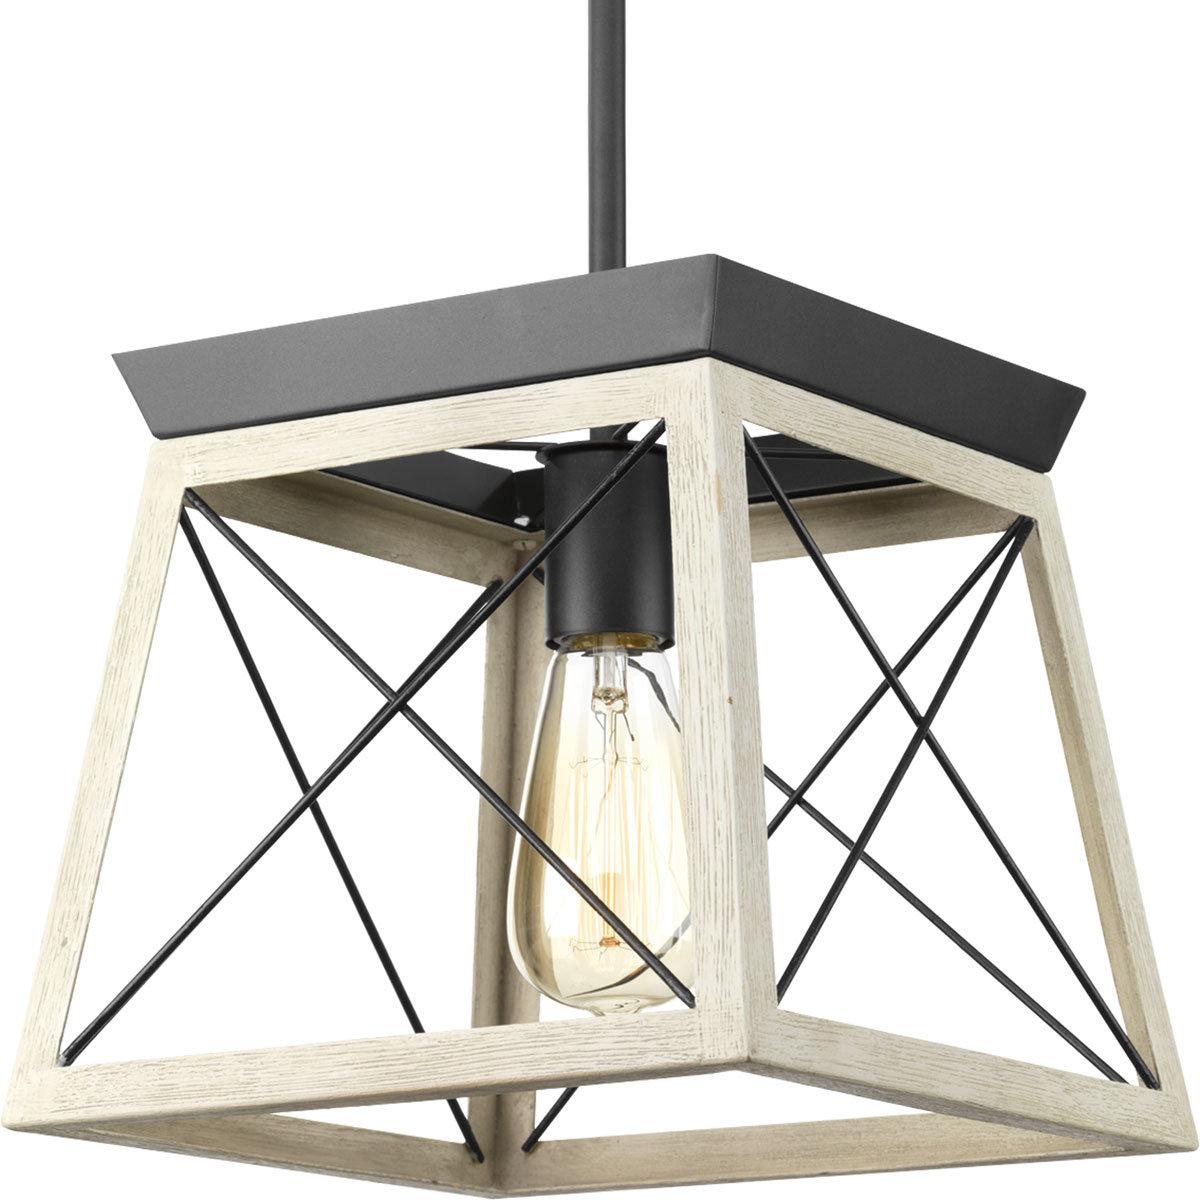 Delon 1 Light Lantern Pendant In Most Current Louanne 1 Light Lantern Geometric Pendants (View 16 of 20)